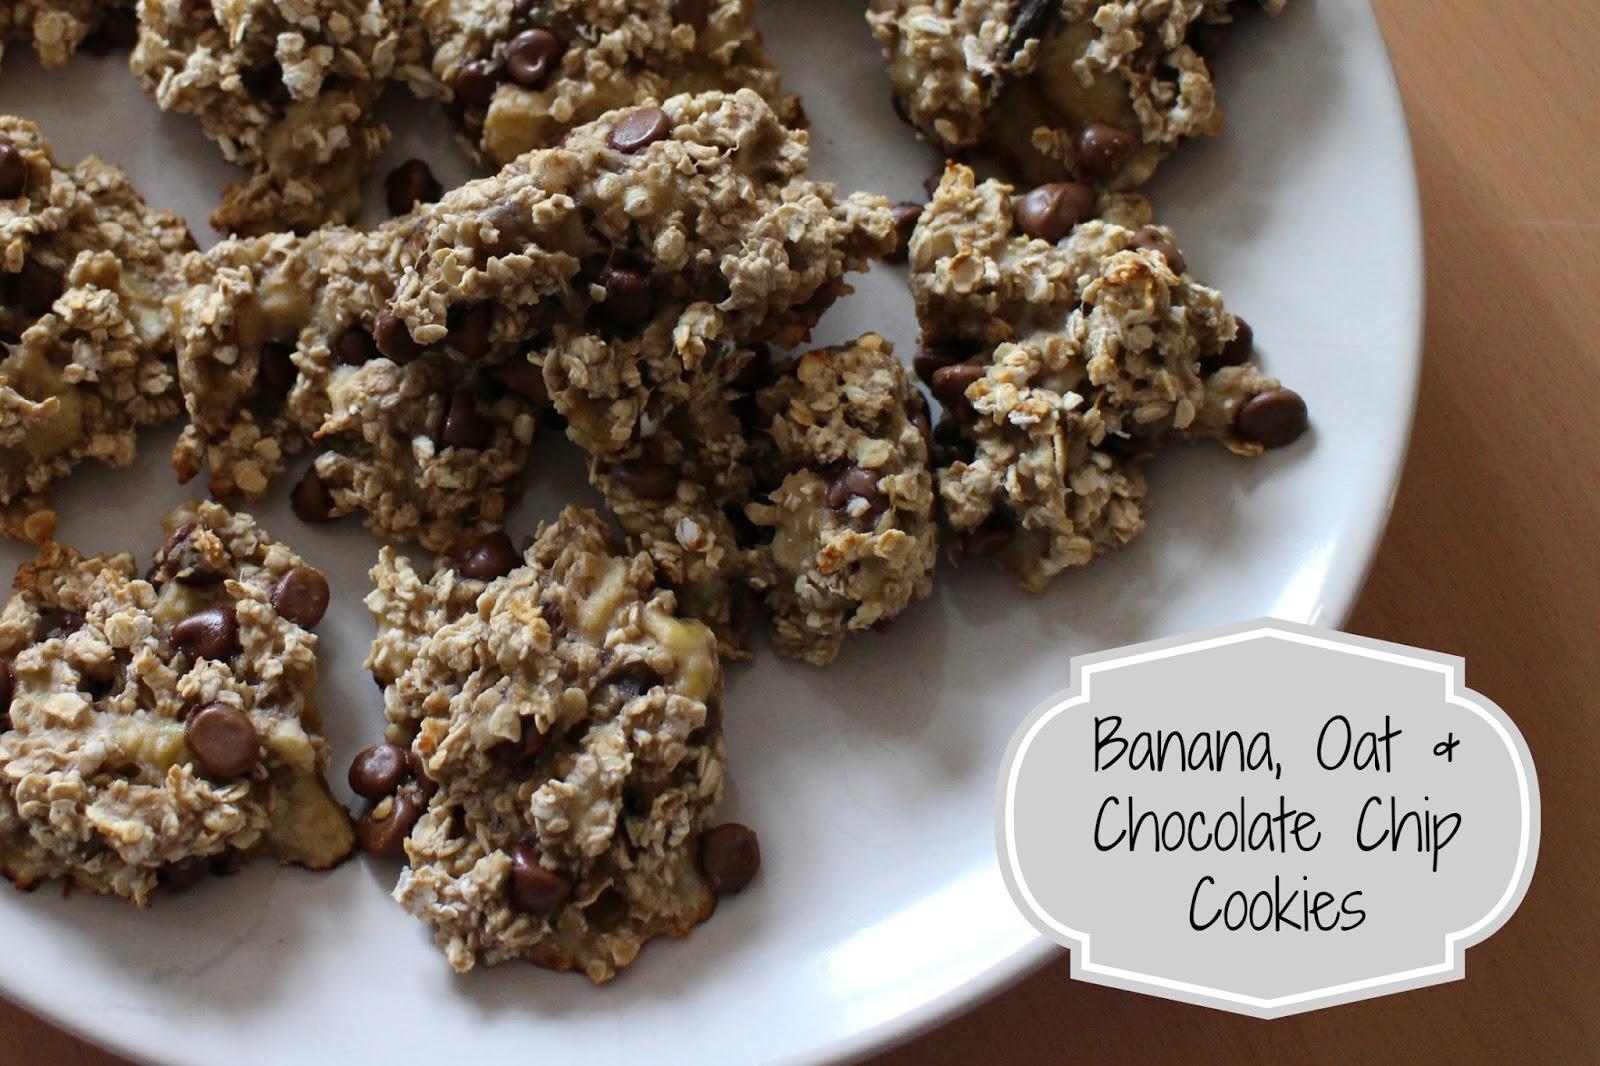 Banana, Oat & Chocolate Chip Cookies